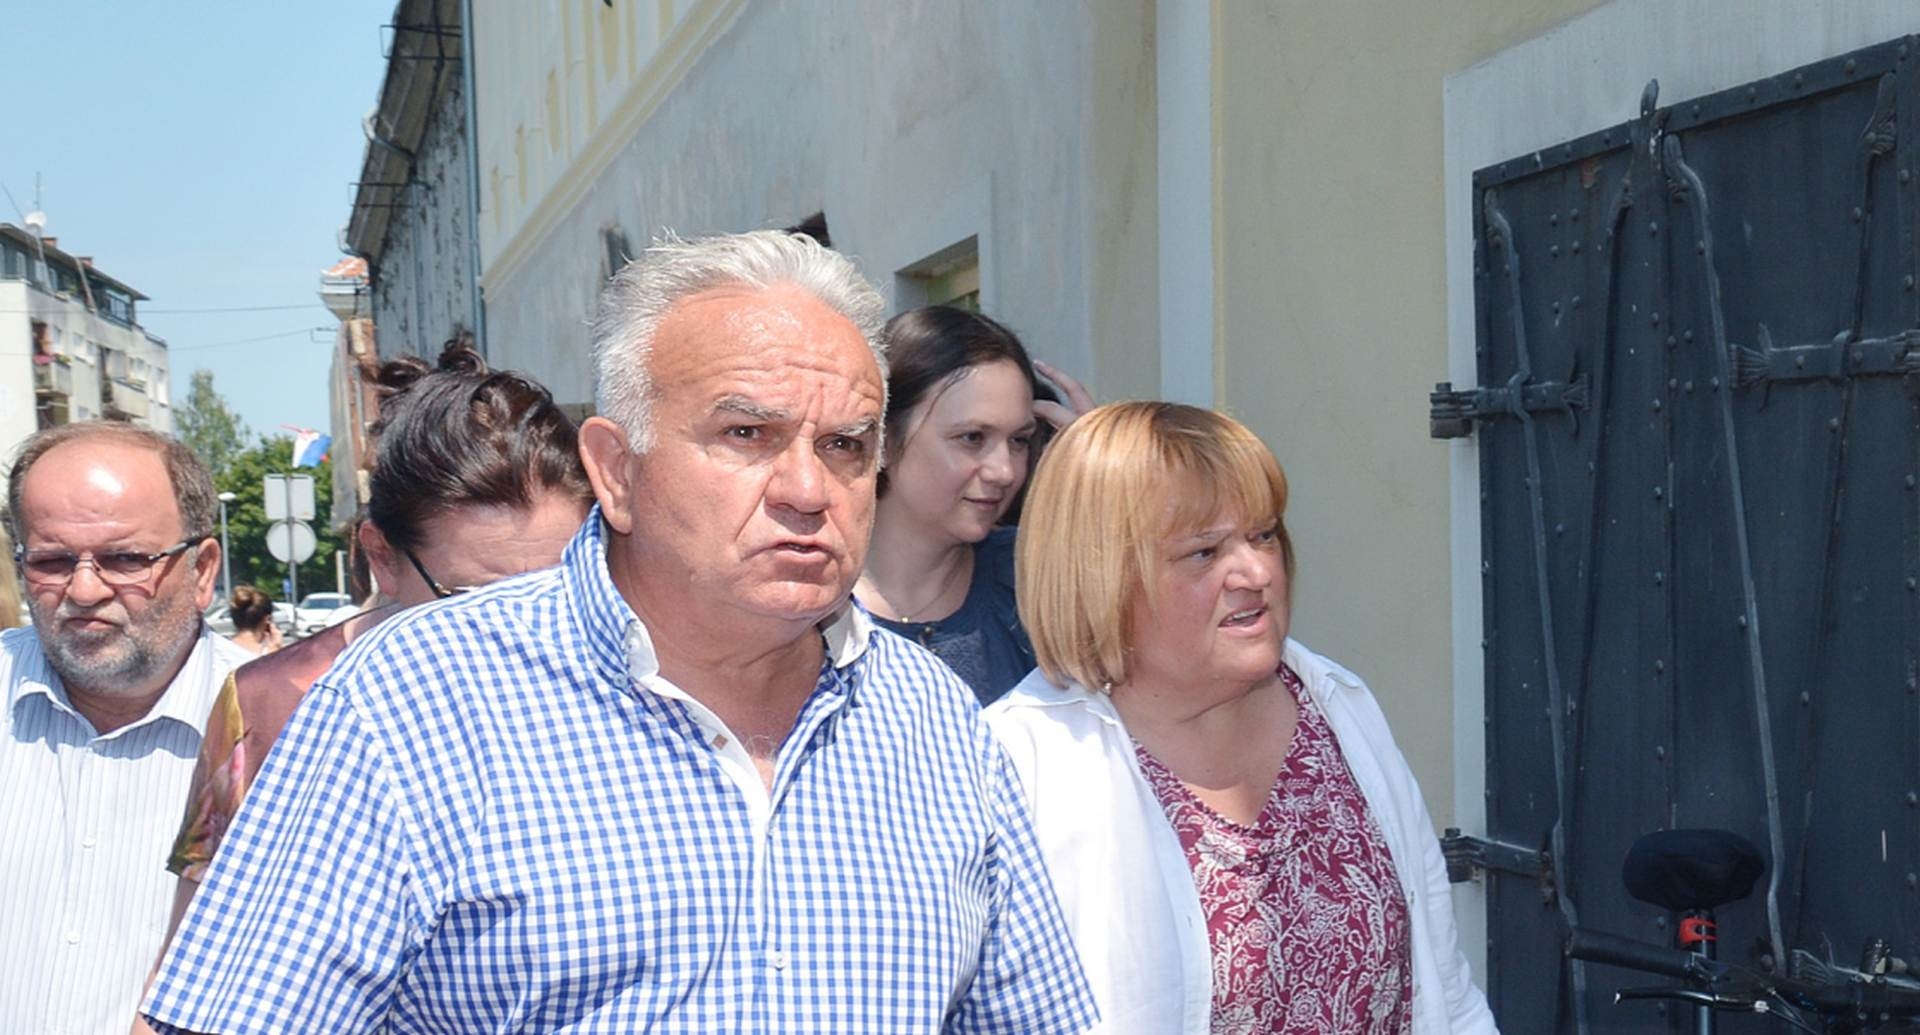 PREŠAO ČAČIĆU: Petrinjski gradonačelnik napustio HNS